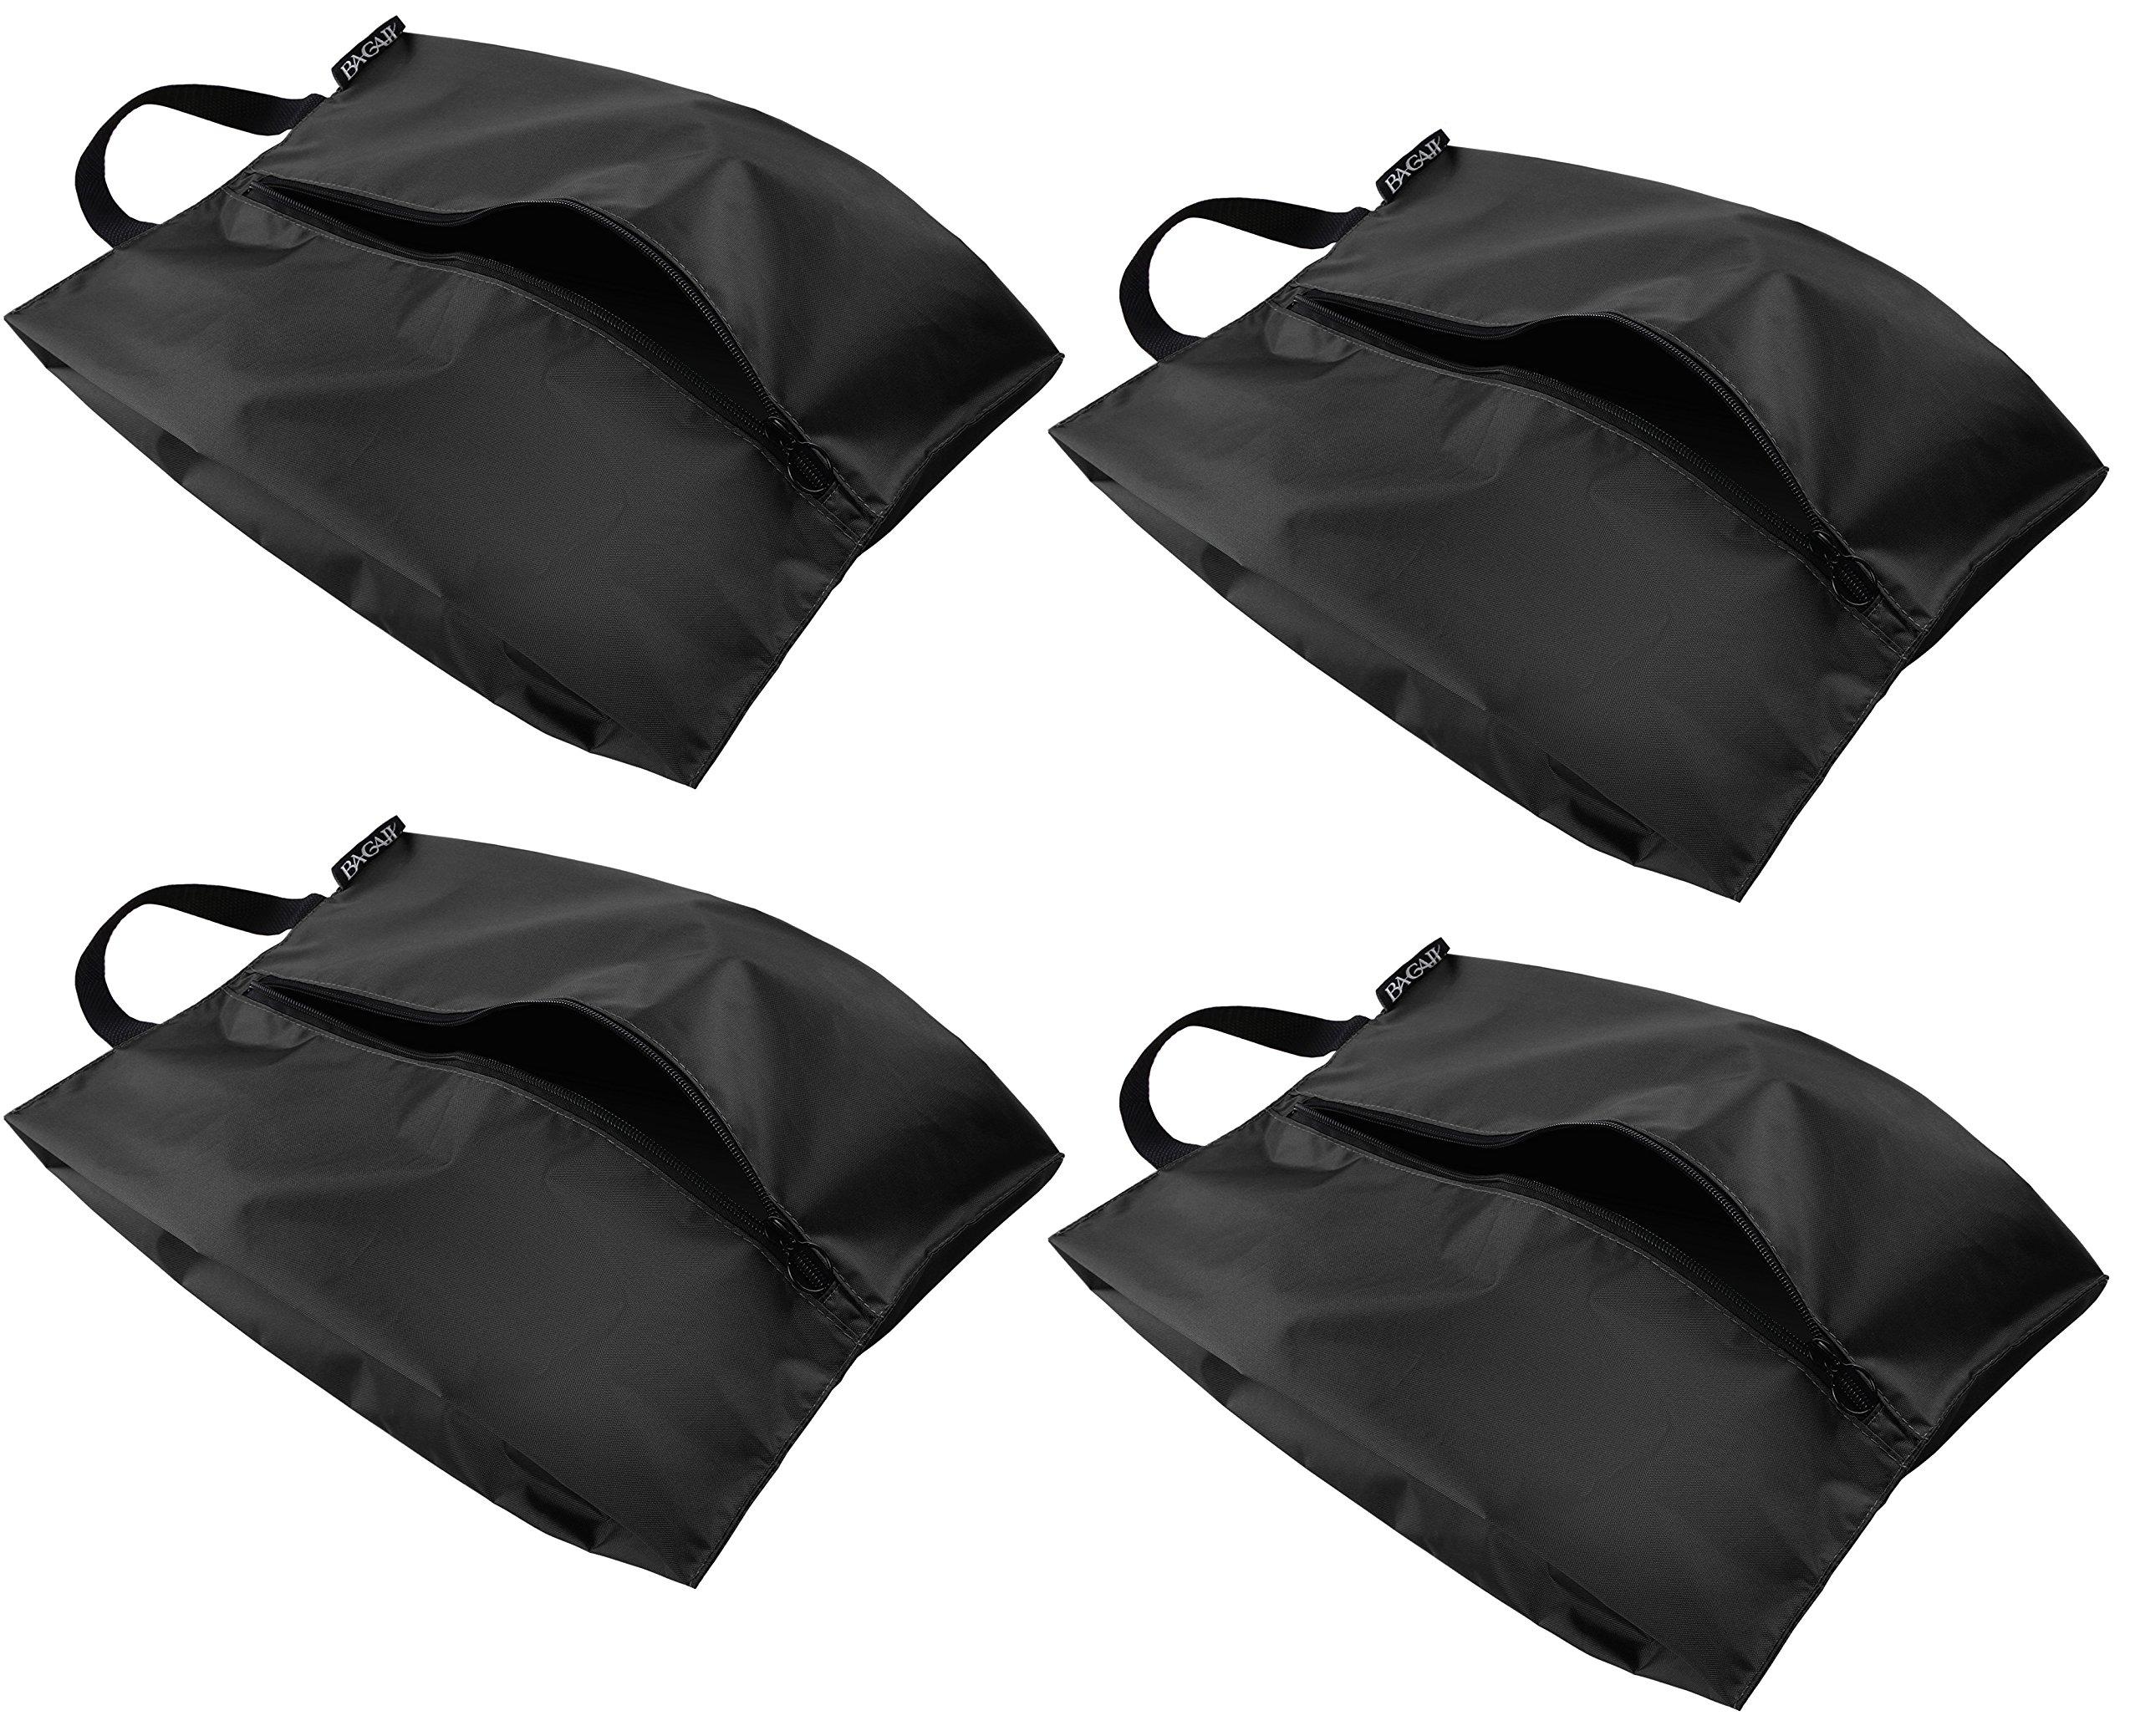 Bagail Travel Shoe Bags Set of 4 Lightweight Waterproof Nylon Storage Bag for Men & Women (Standard Size, Black (2 XL & 2 Standard))